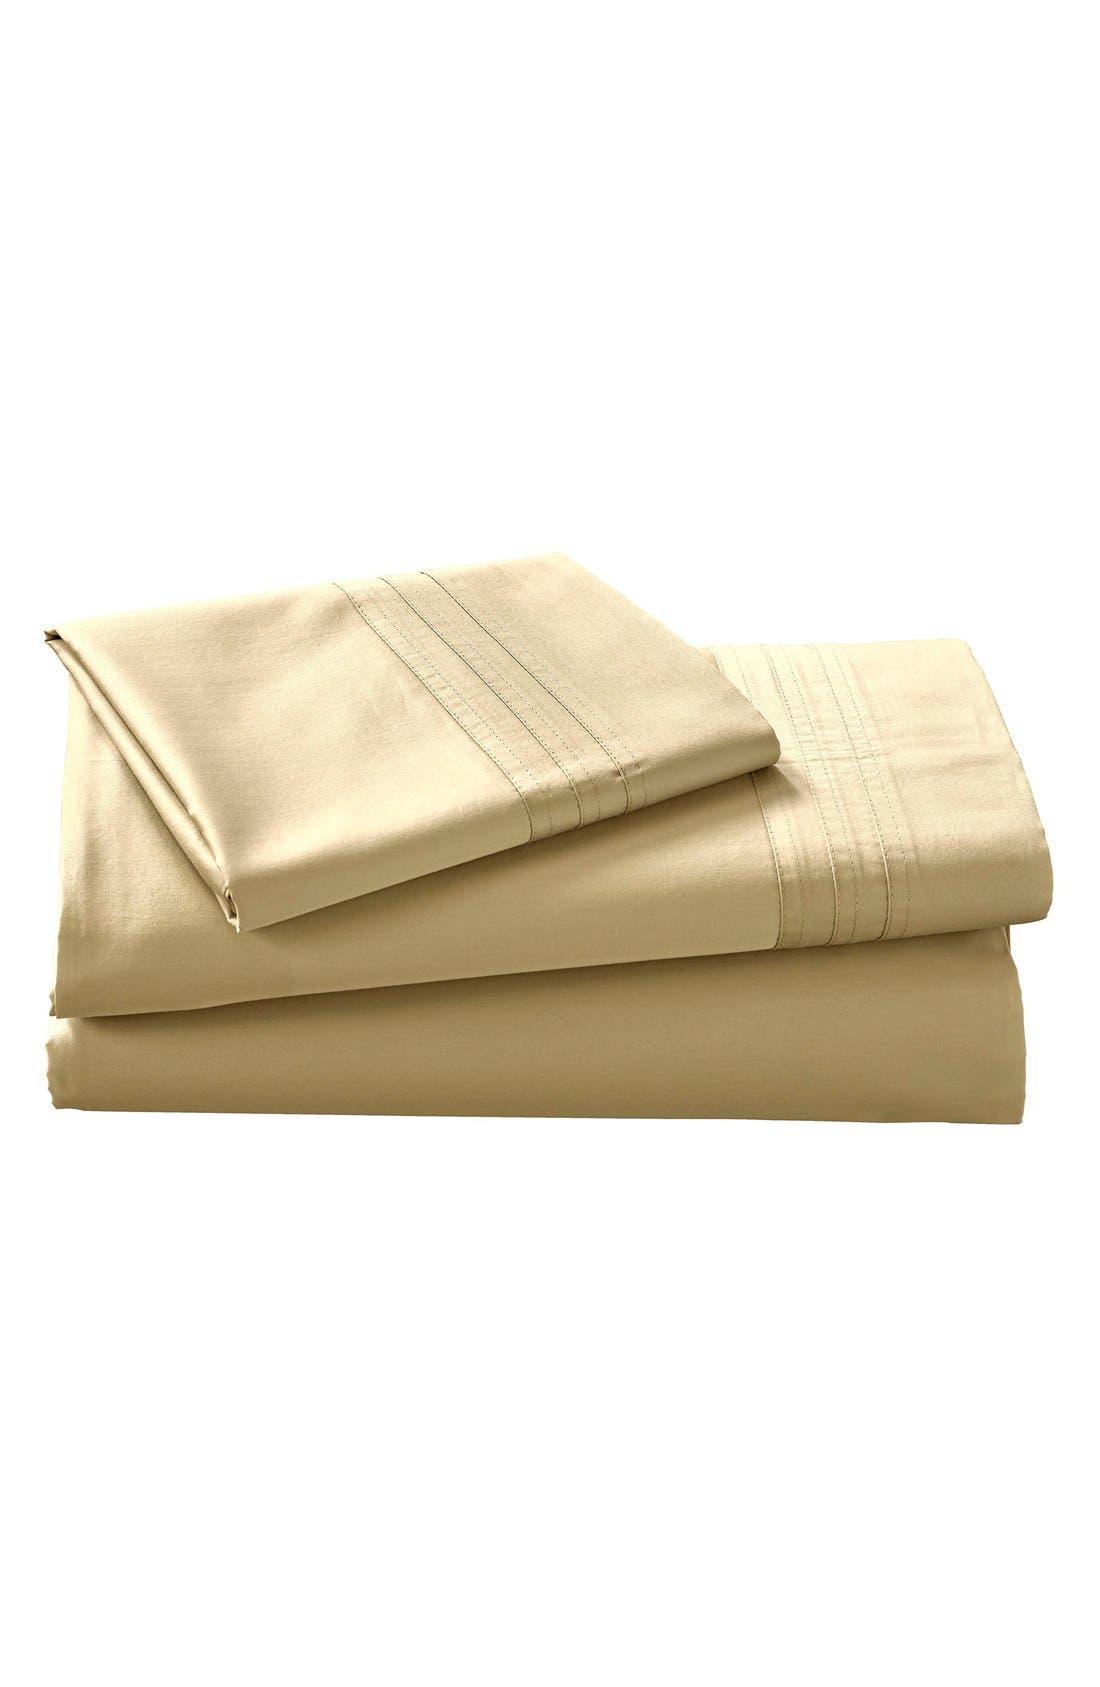 Donna Karan Collection 510 Thread Count Pillowcases,                             Alternate thumbnail 9, color,